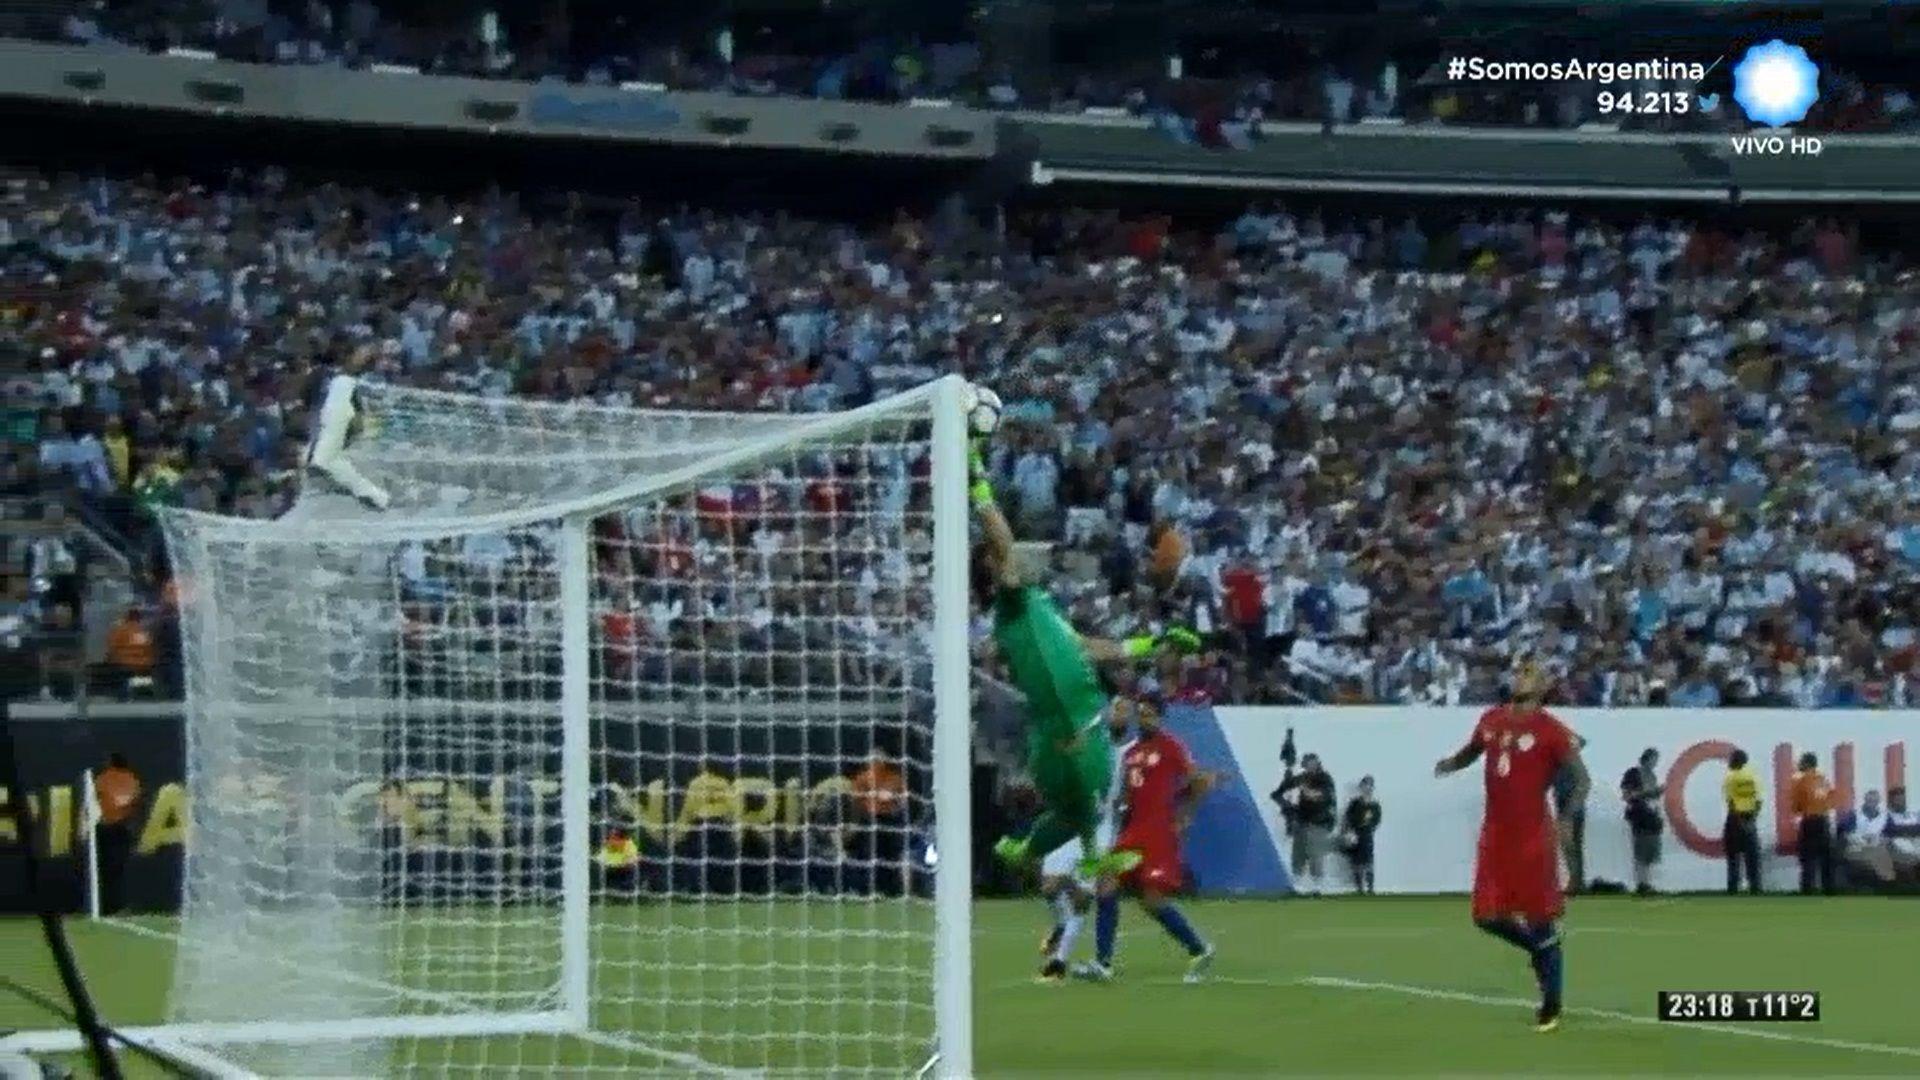 La atajada de la Copa: la estirada de Bravo que le ahogó el gol a Agüero